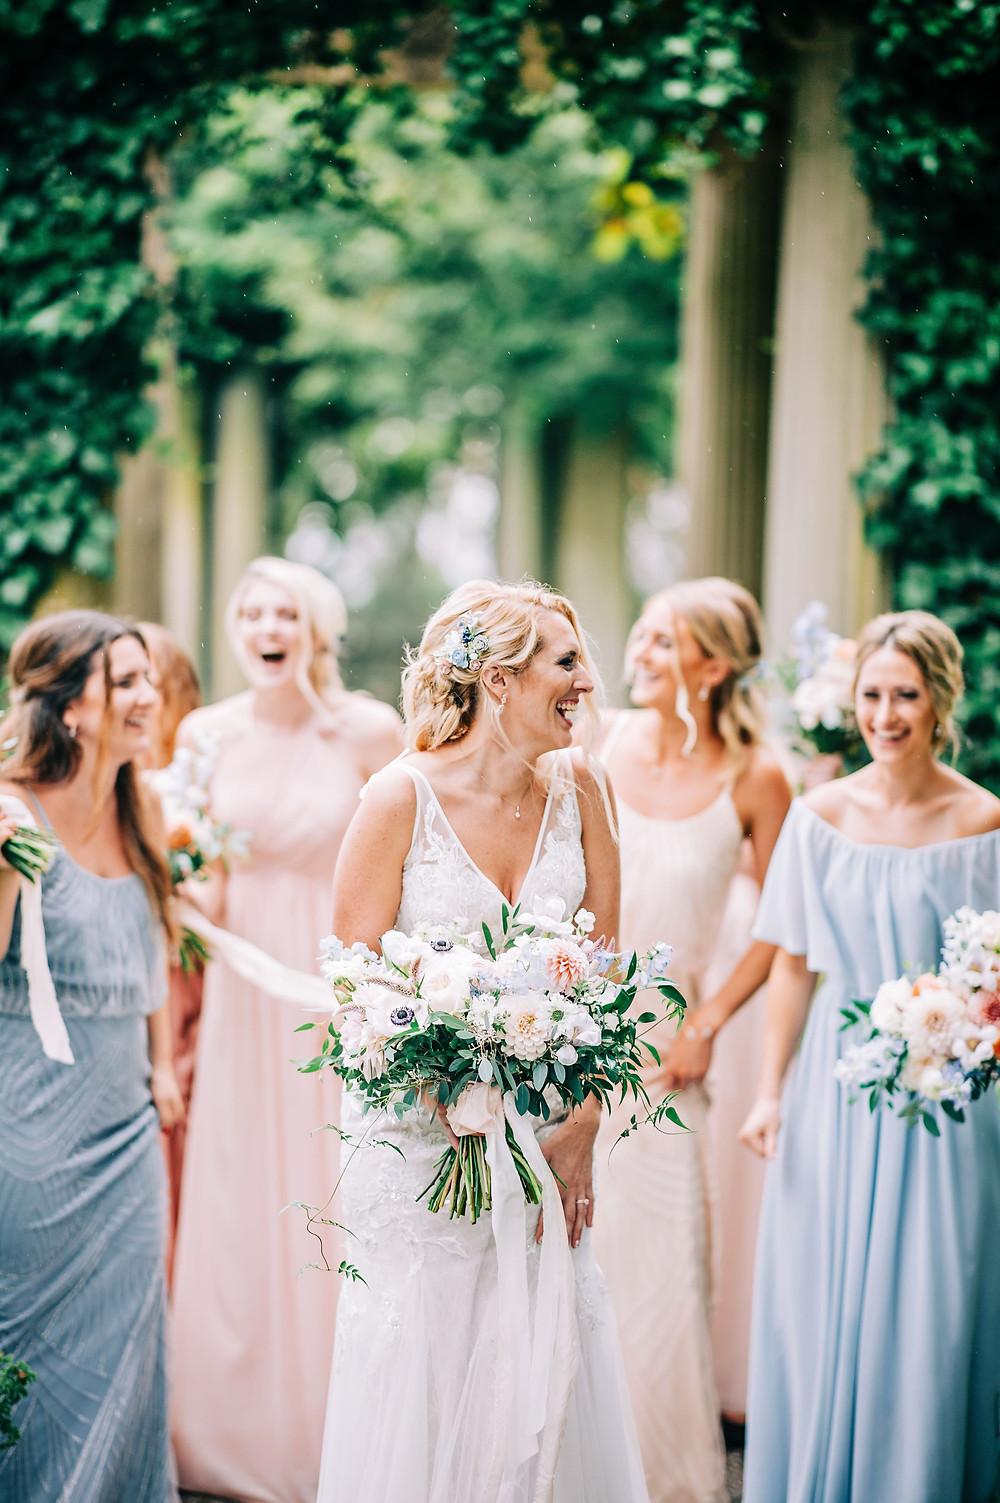 Pastel Summer Wedding at Eolia Mansion